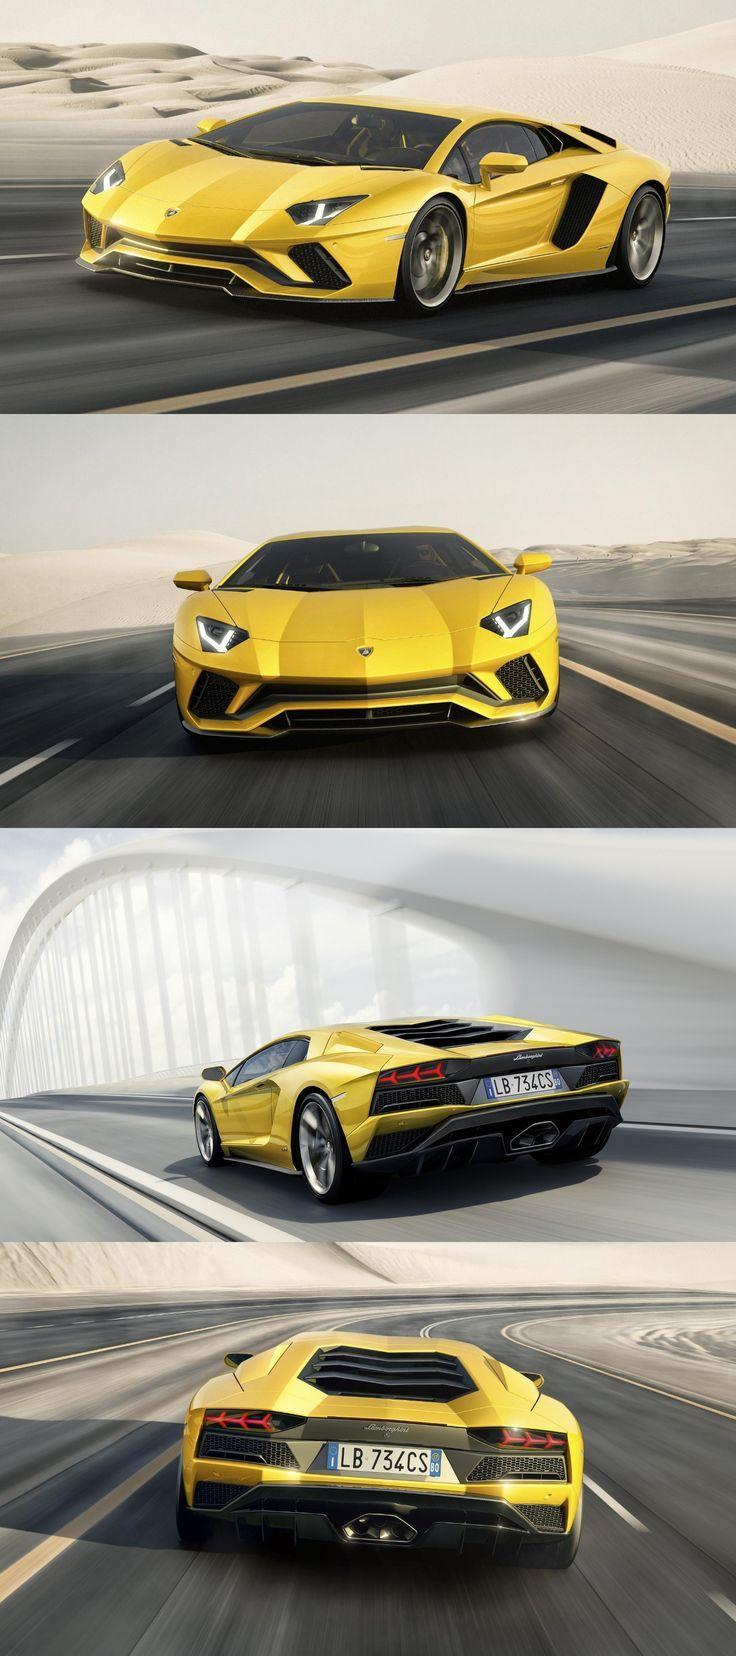 Lamborghini Aventador S Coupe Unveiled with 730 Horsepower - https://www.luxury.guugles.com/lamborghini-aventador-s-coupe-unveiled-with-730-horsepower/